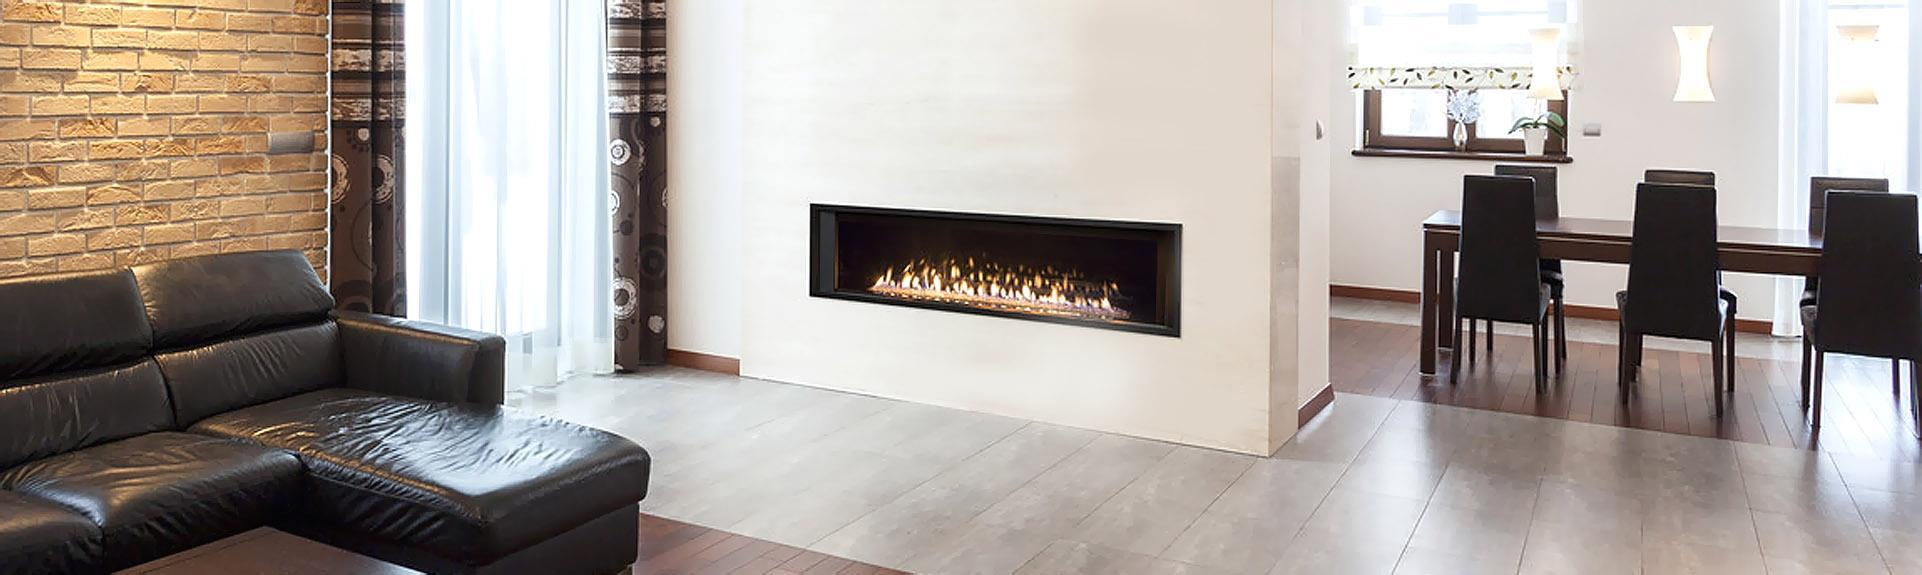 wood stove fireplace eatontown monmouth county nj rh woodstovenj com